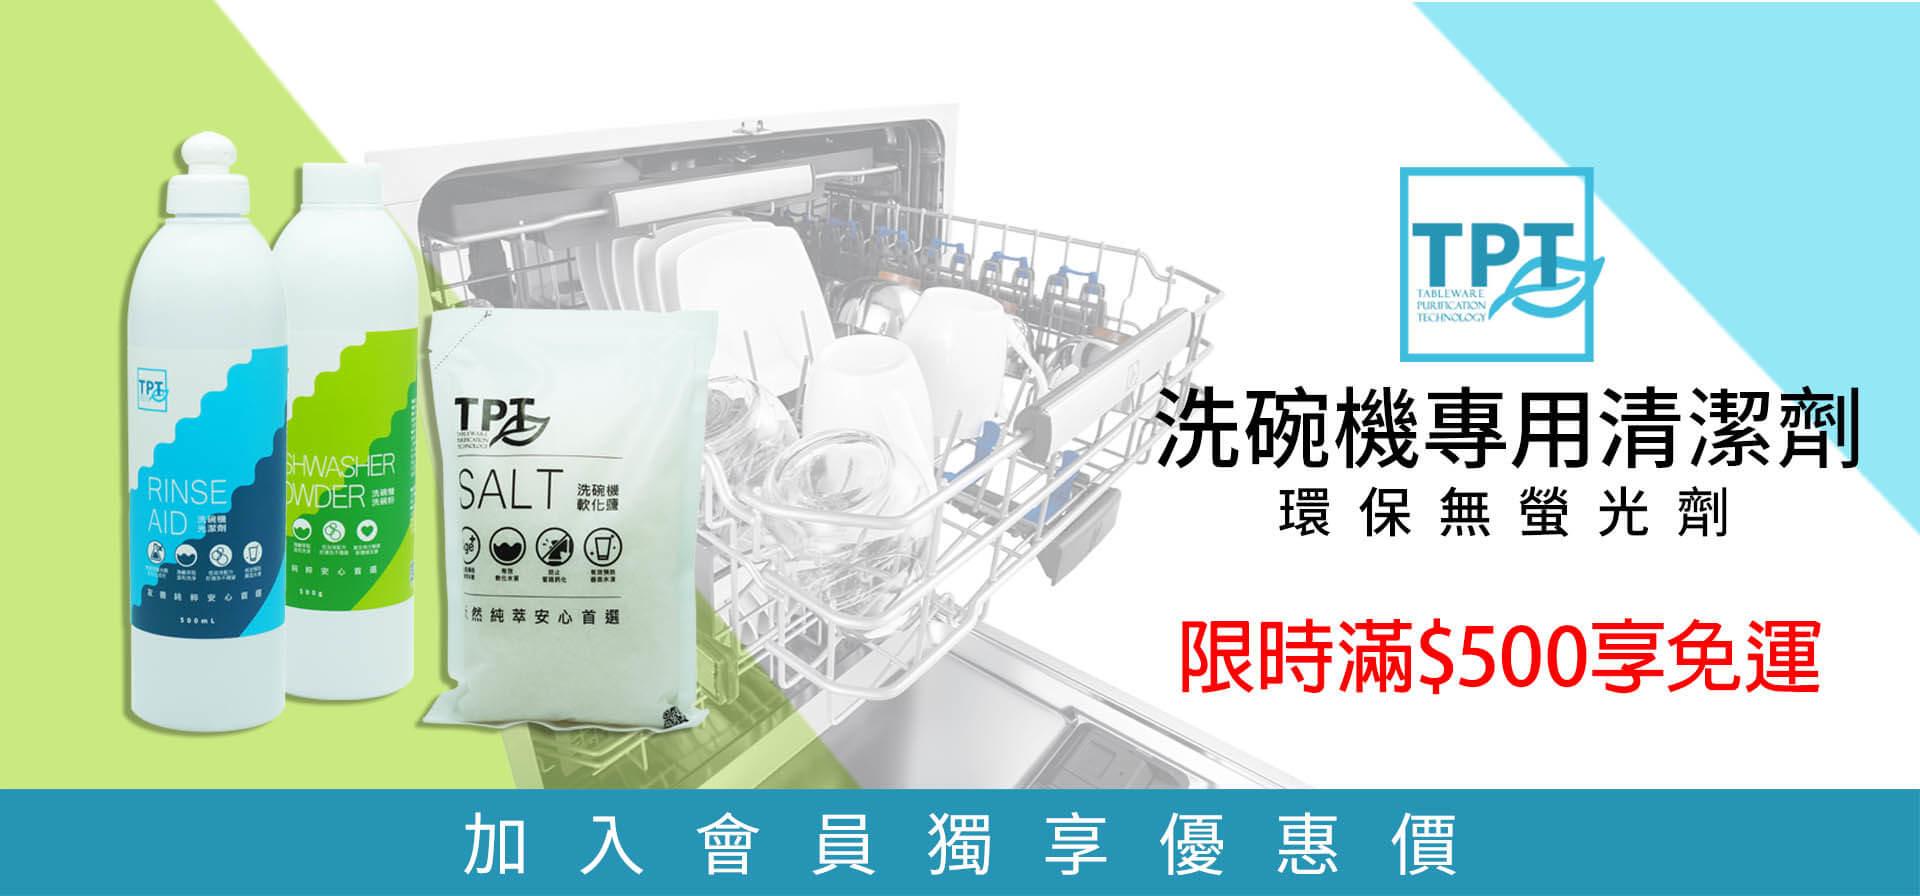 TPT洗碗粉 洗碗機專用清潔劑 TPT光潔劑 TPT軟化鹽